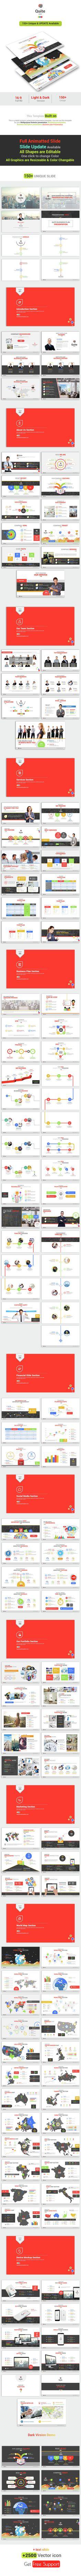 Multipurpose Business Powerpoint Presentation Template. Download here: http://graphicriver.net/item/multipurpose-business-powerpoint-presentation-template/14856248?ref=ksioks